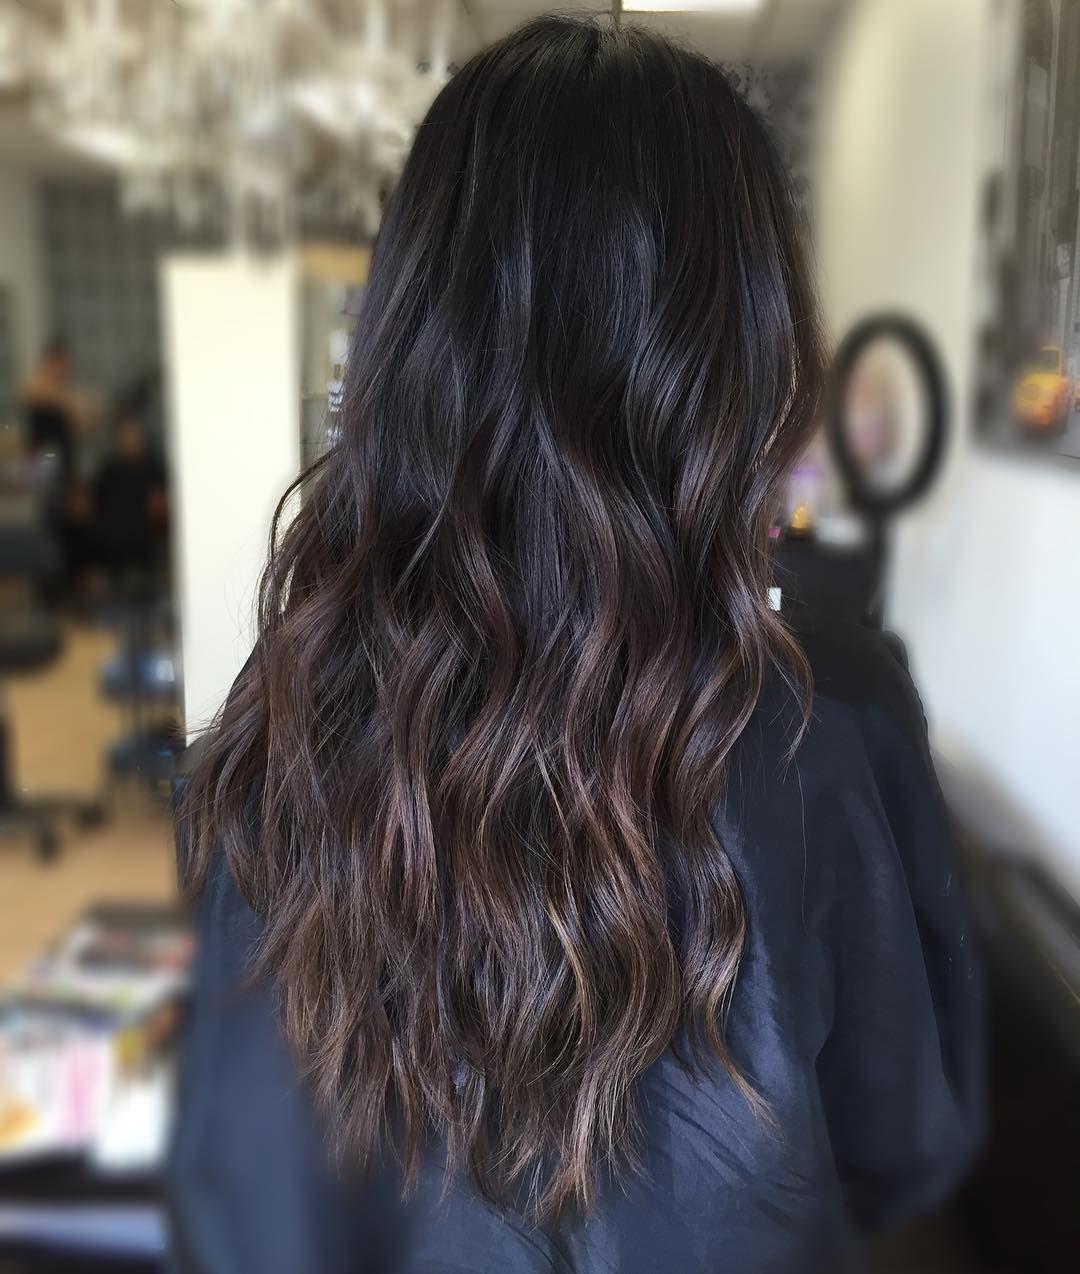 Dark Brown Hair With Subtle Brown Balayage Brown Hair Balayage Hair Highlights Balayage Hair